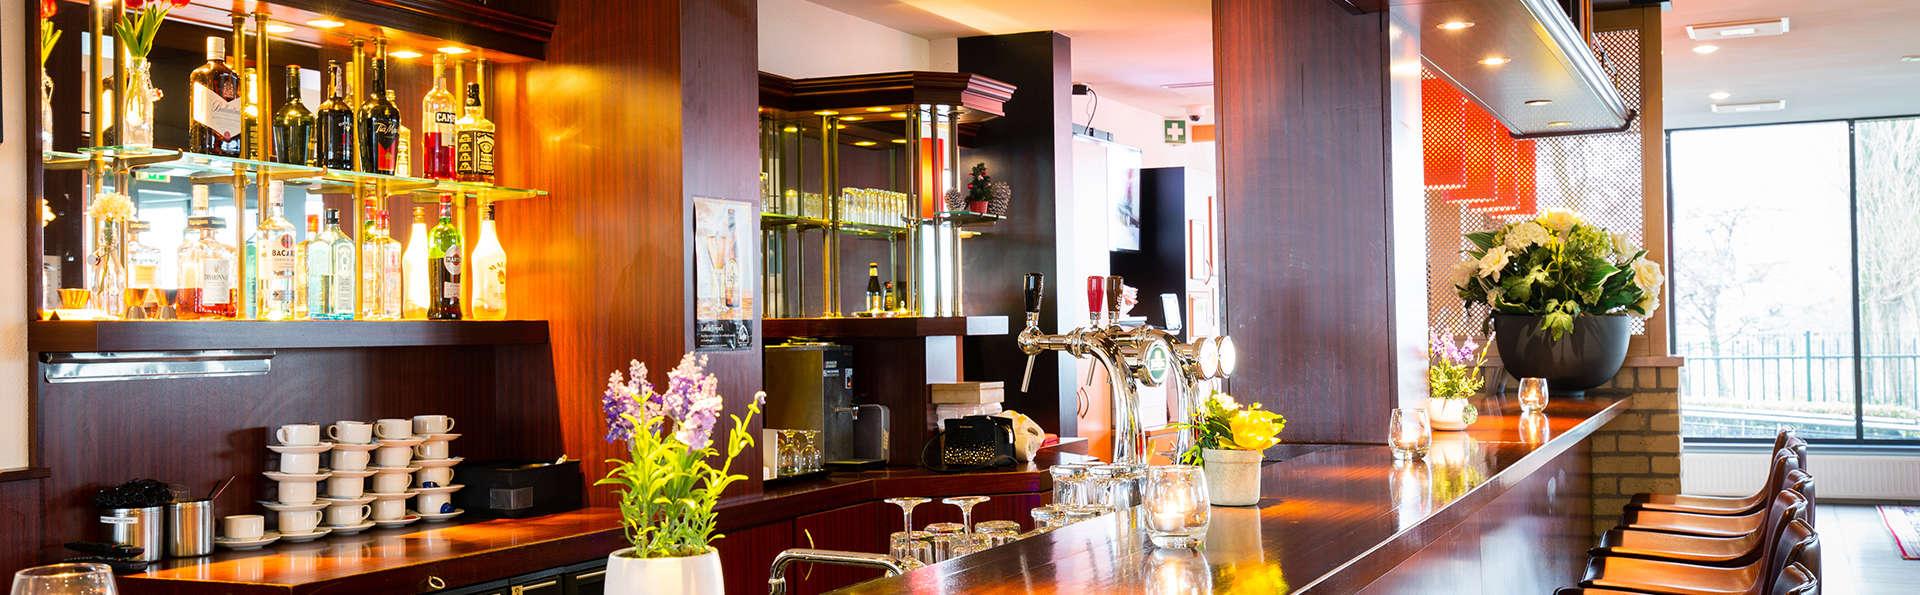 Bastion Hotel Dordrecht Papendrecht - EDIT_Bar.jpg